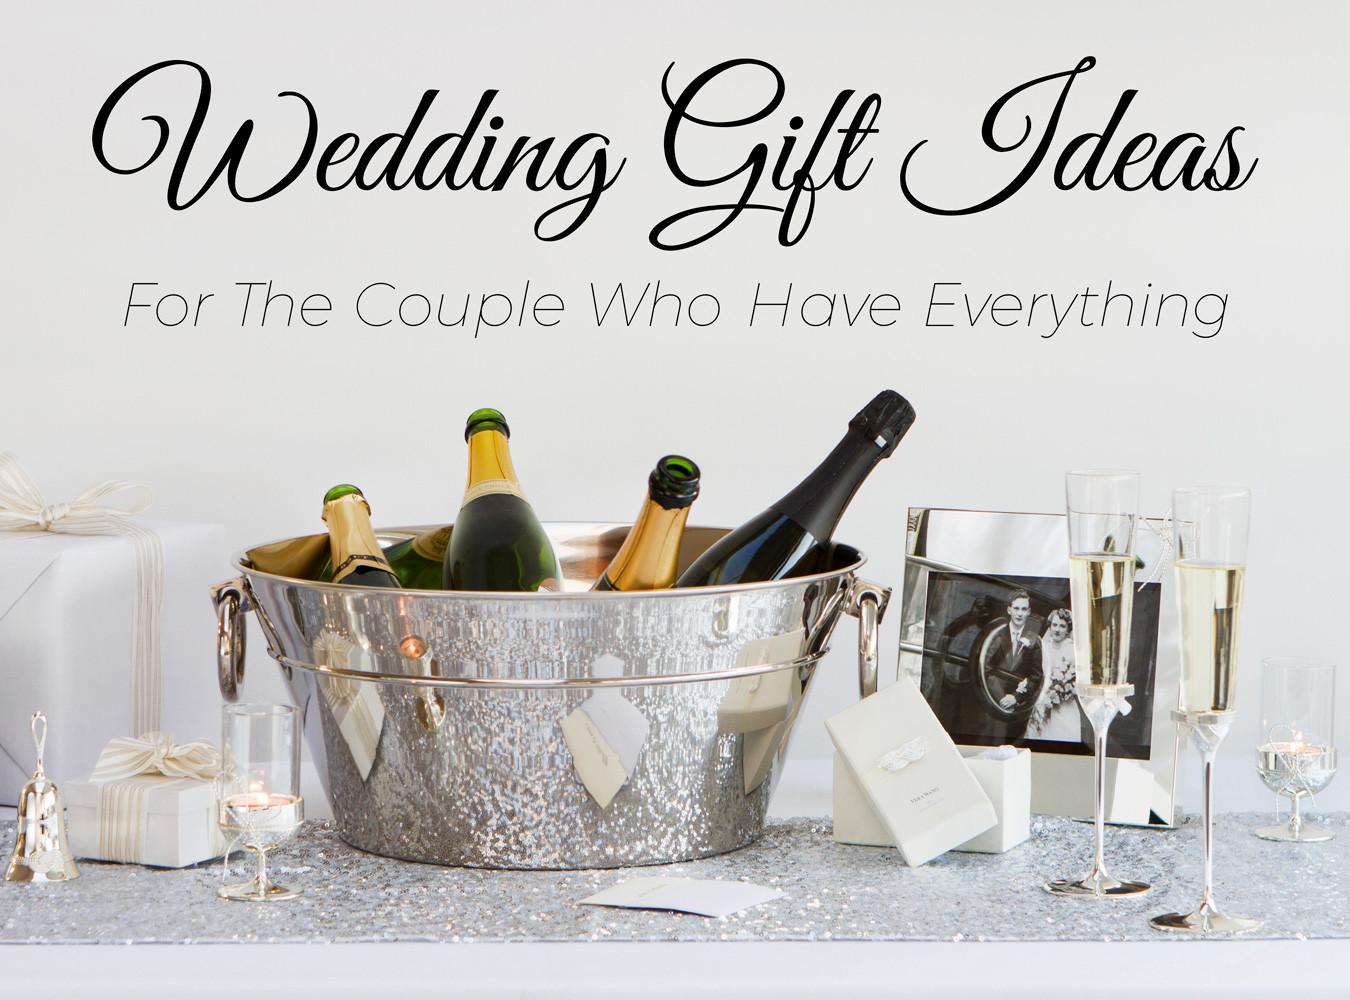 Wedding Gift Ideas Couple Has Everything  5 Wedding Gift Ideas for the Couple Who Have Everything